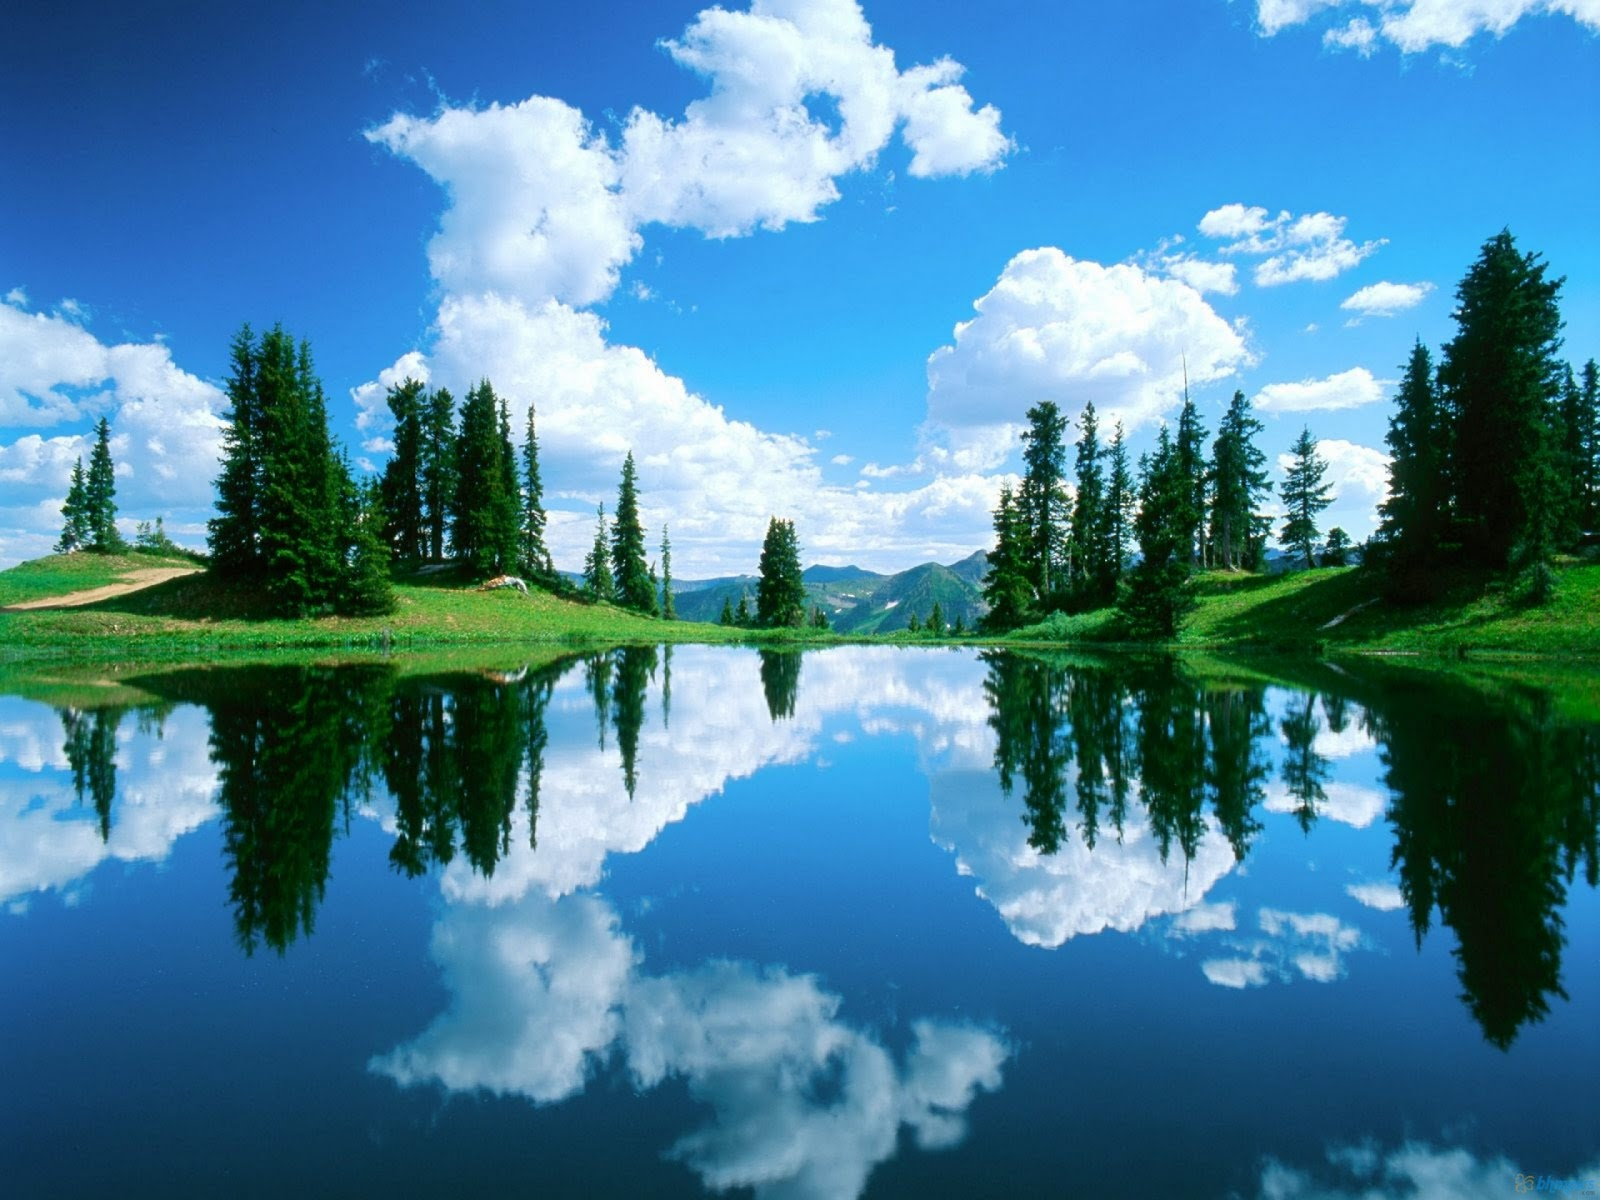 http://3.bp.blogspot.com/-1VezasEauyQ/TuhOGyENJiI/AAAAAAAAAks/BrHb6bILgsI/s1600/alpine_lake_gunnison-1920x1440.jpg